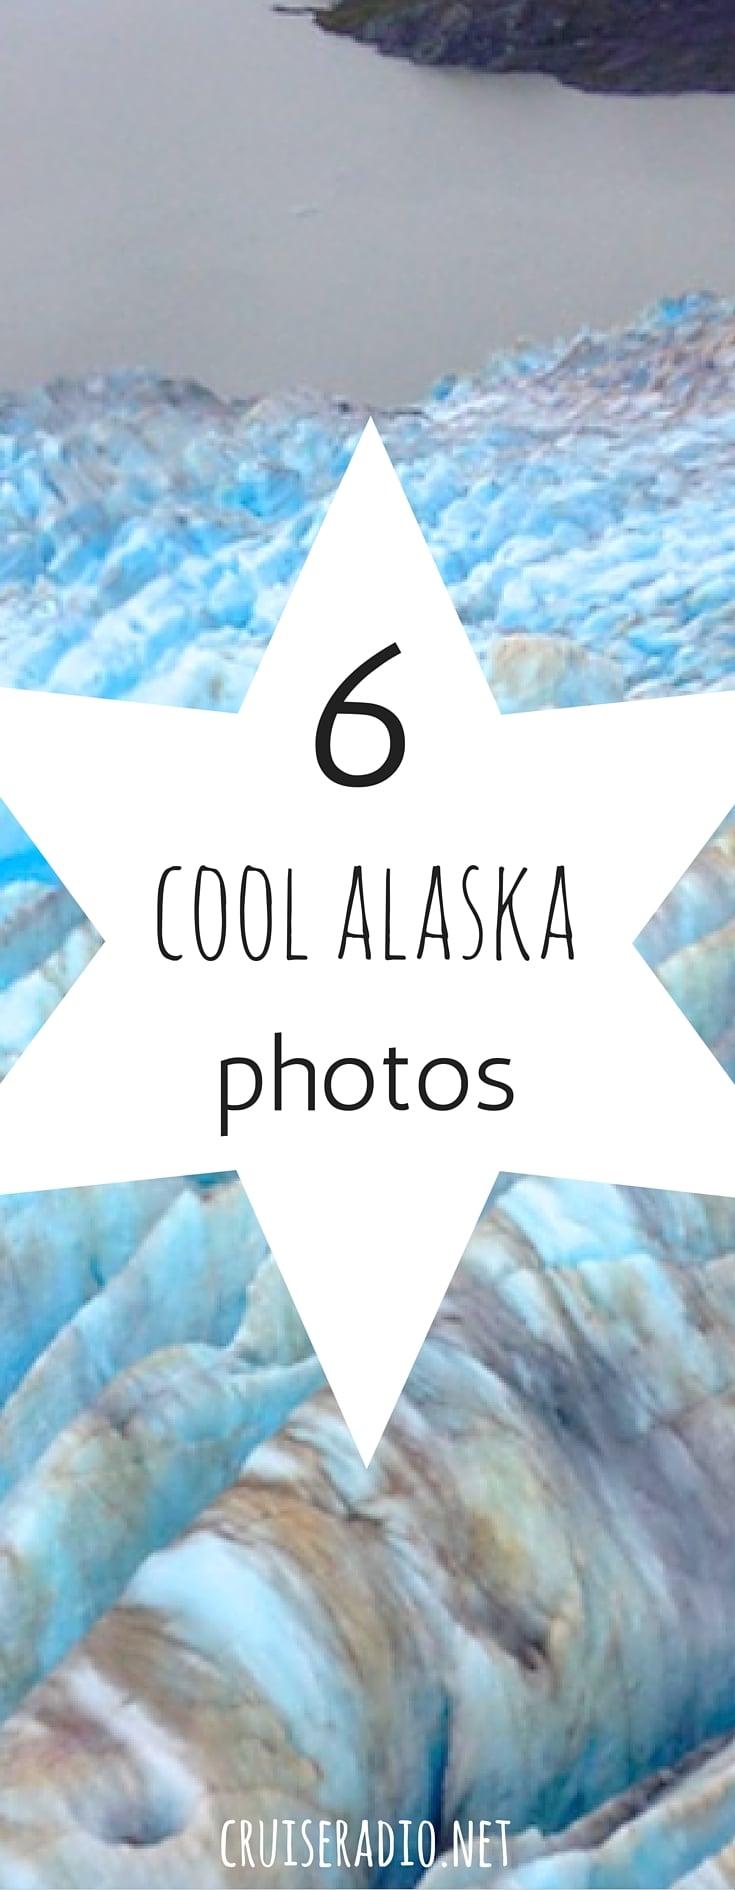 #alaska #photo #photography #cruise #travel #wander